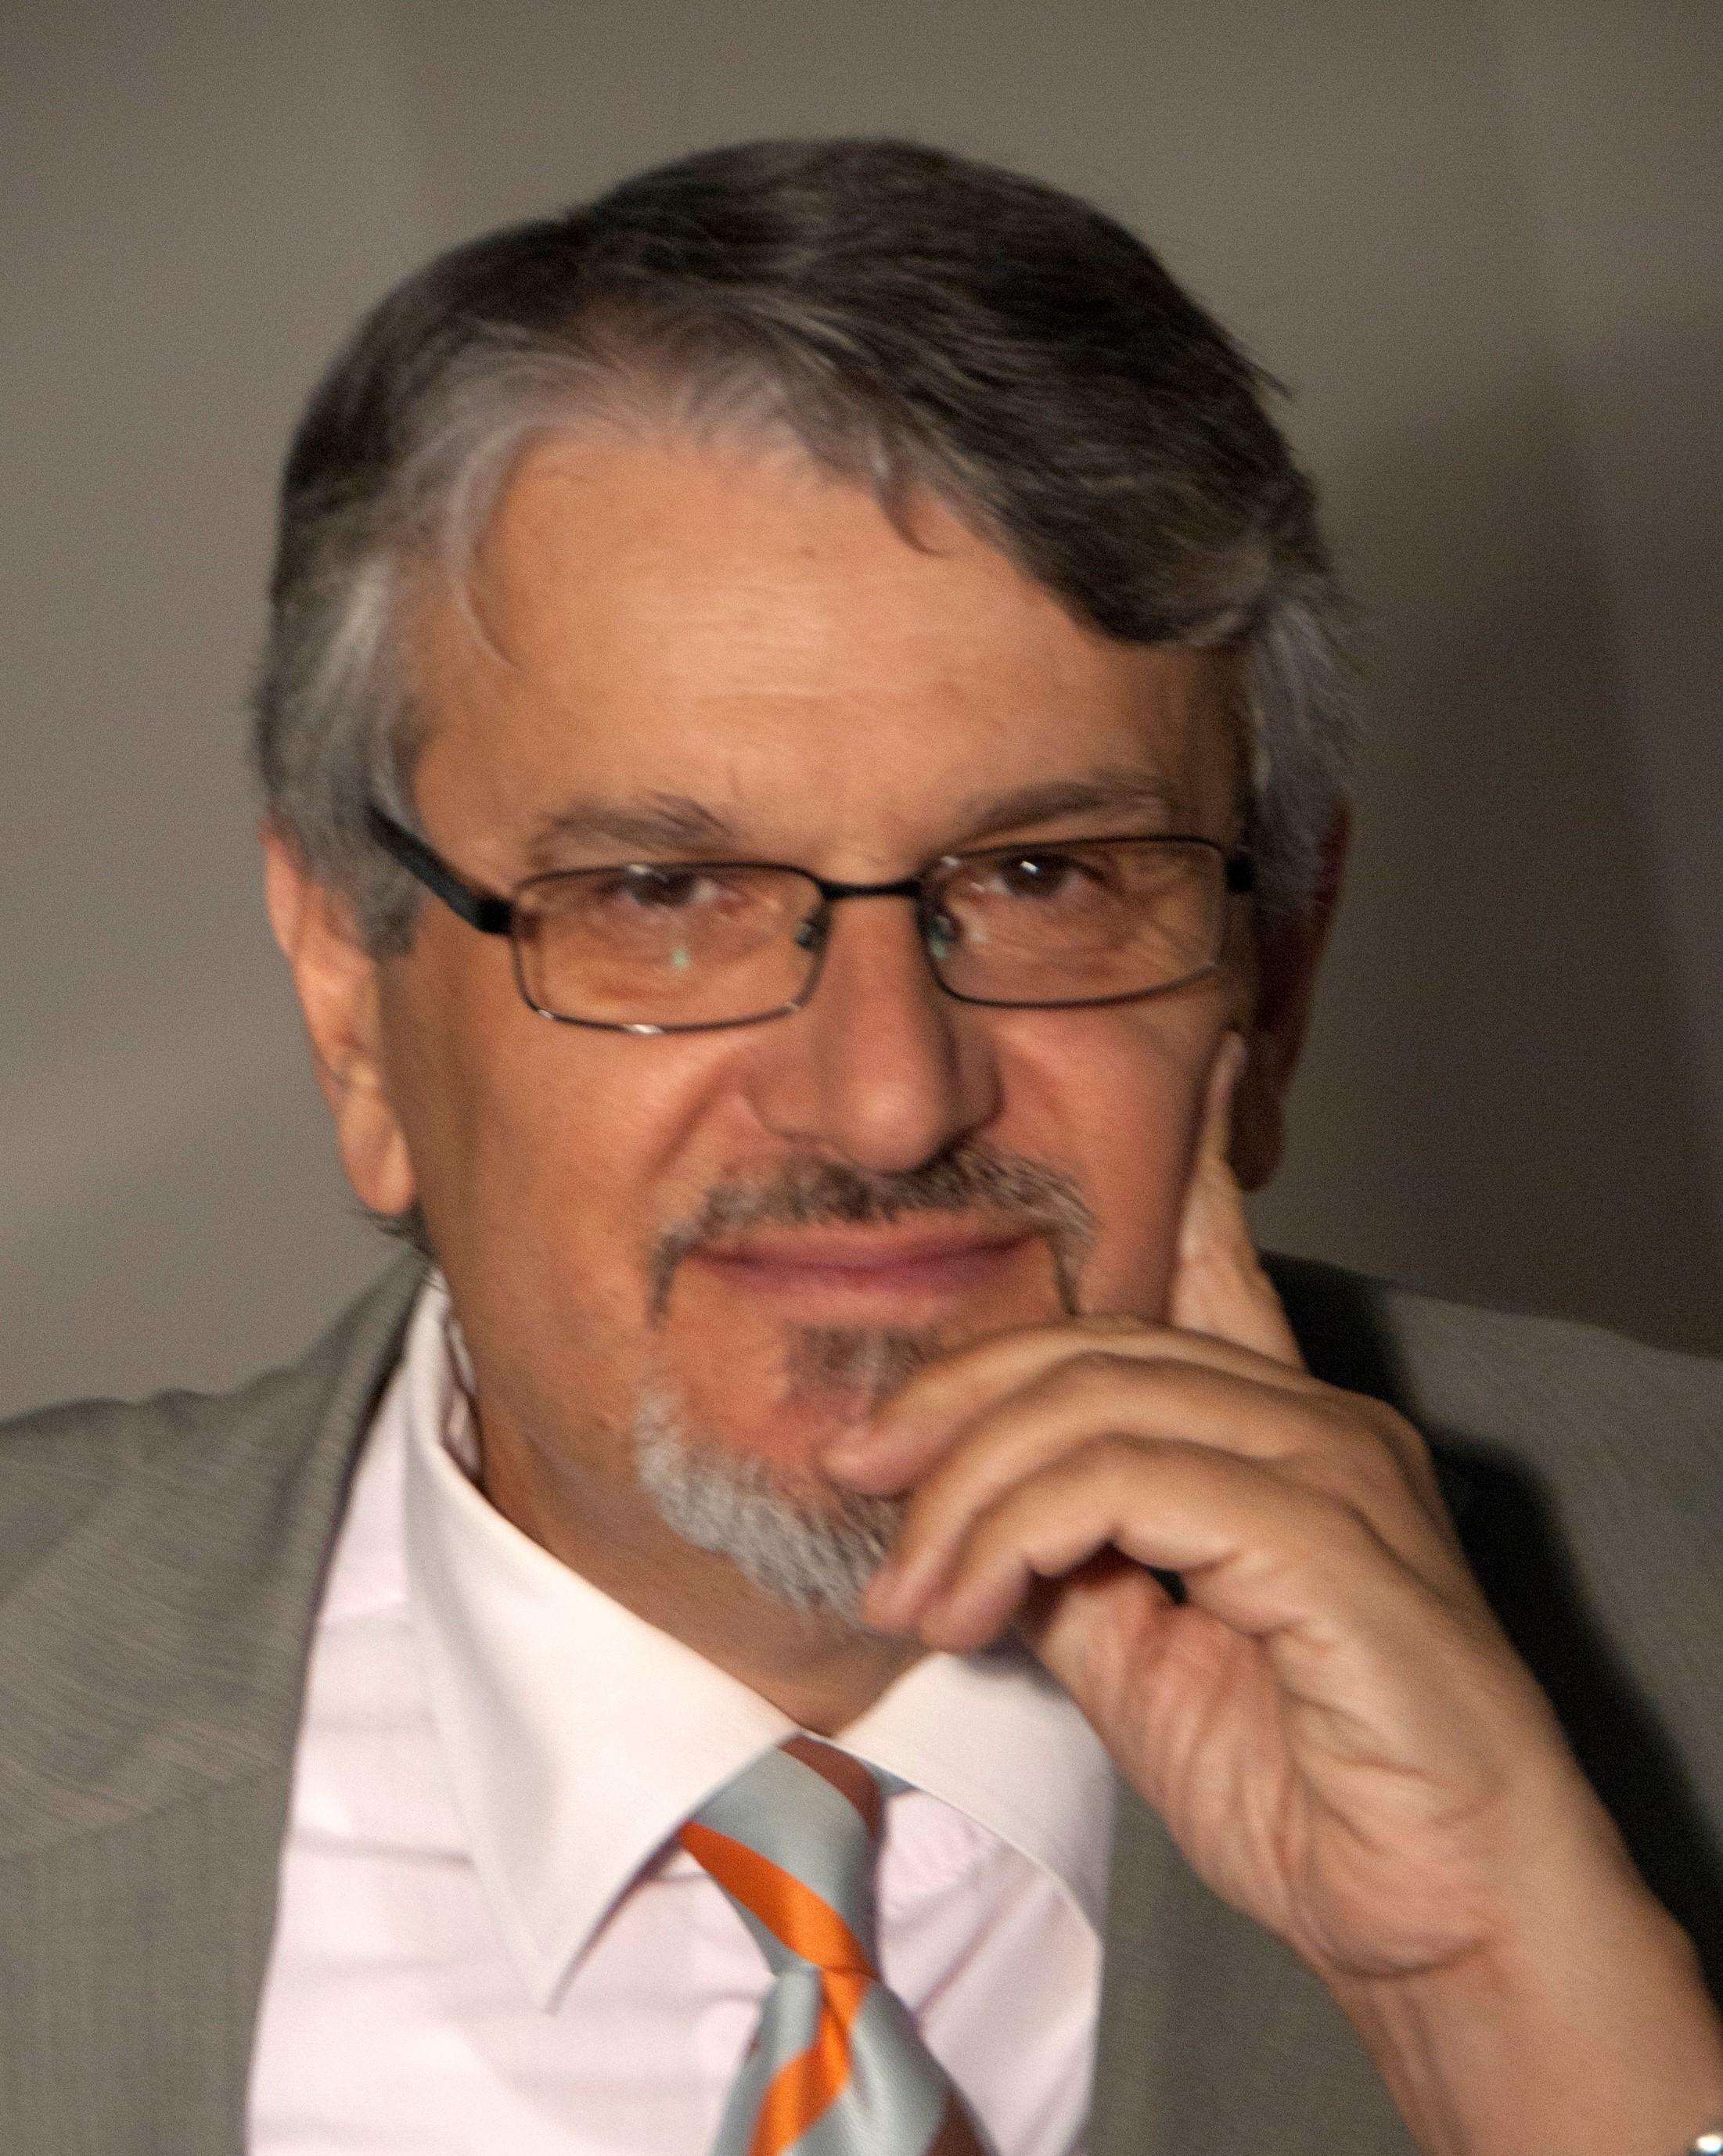 Dr. George Papaioannou